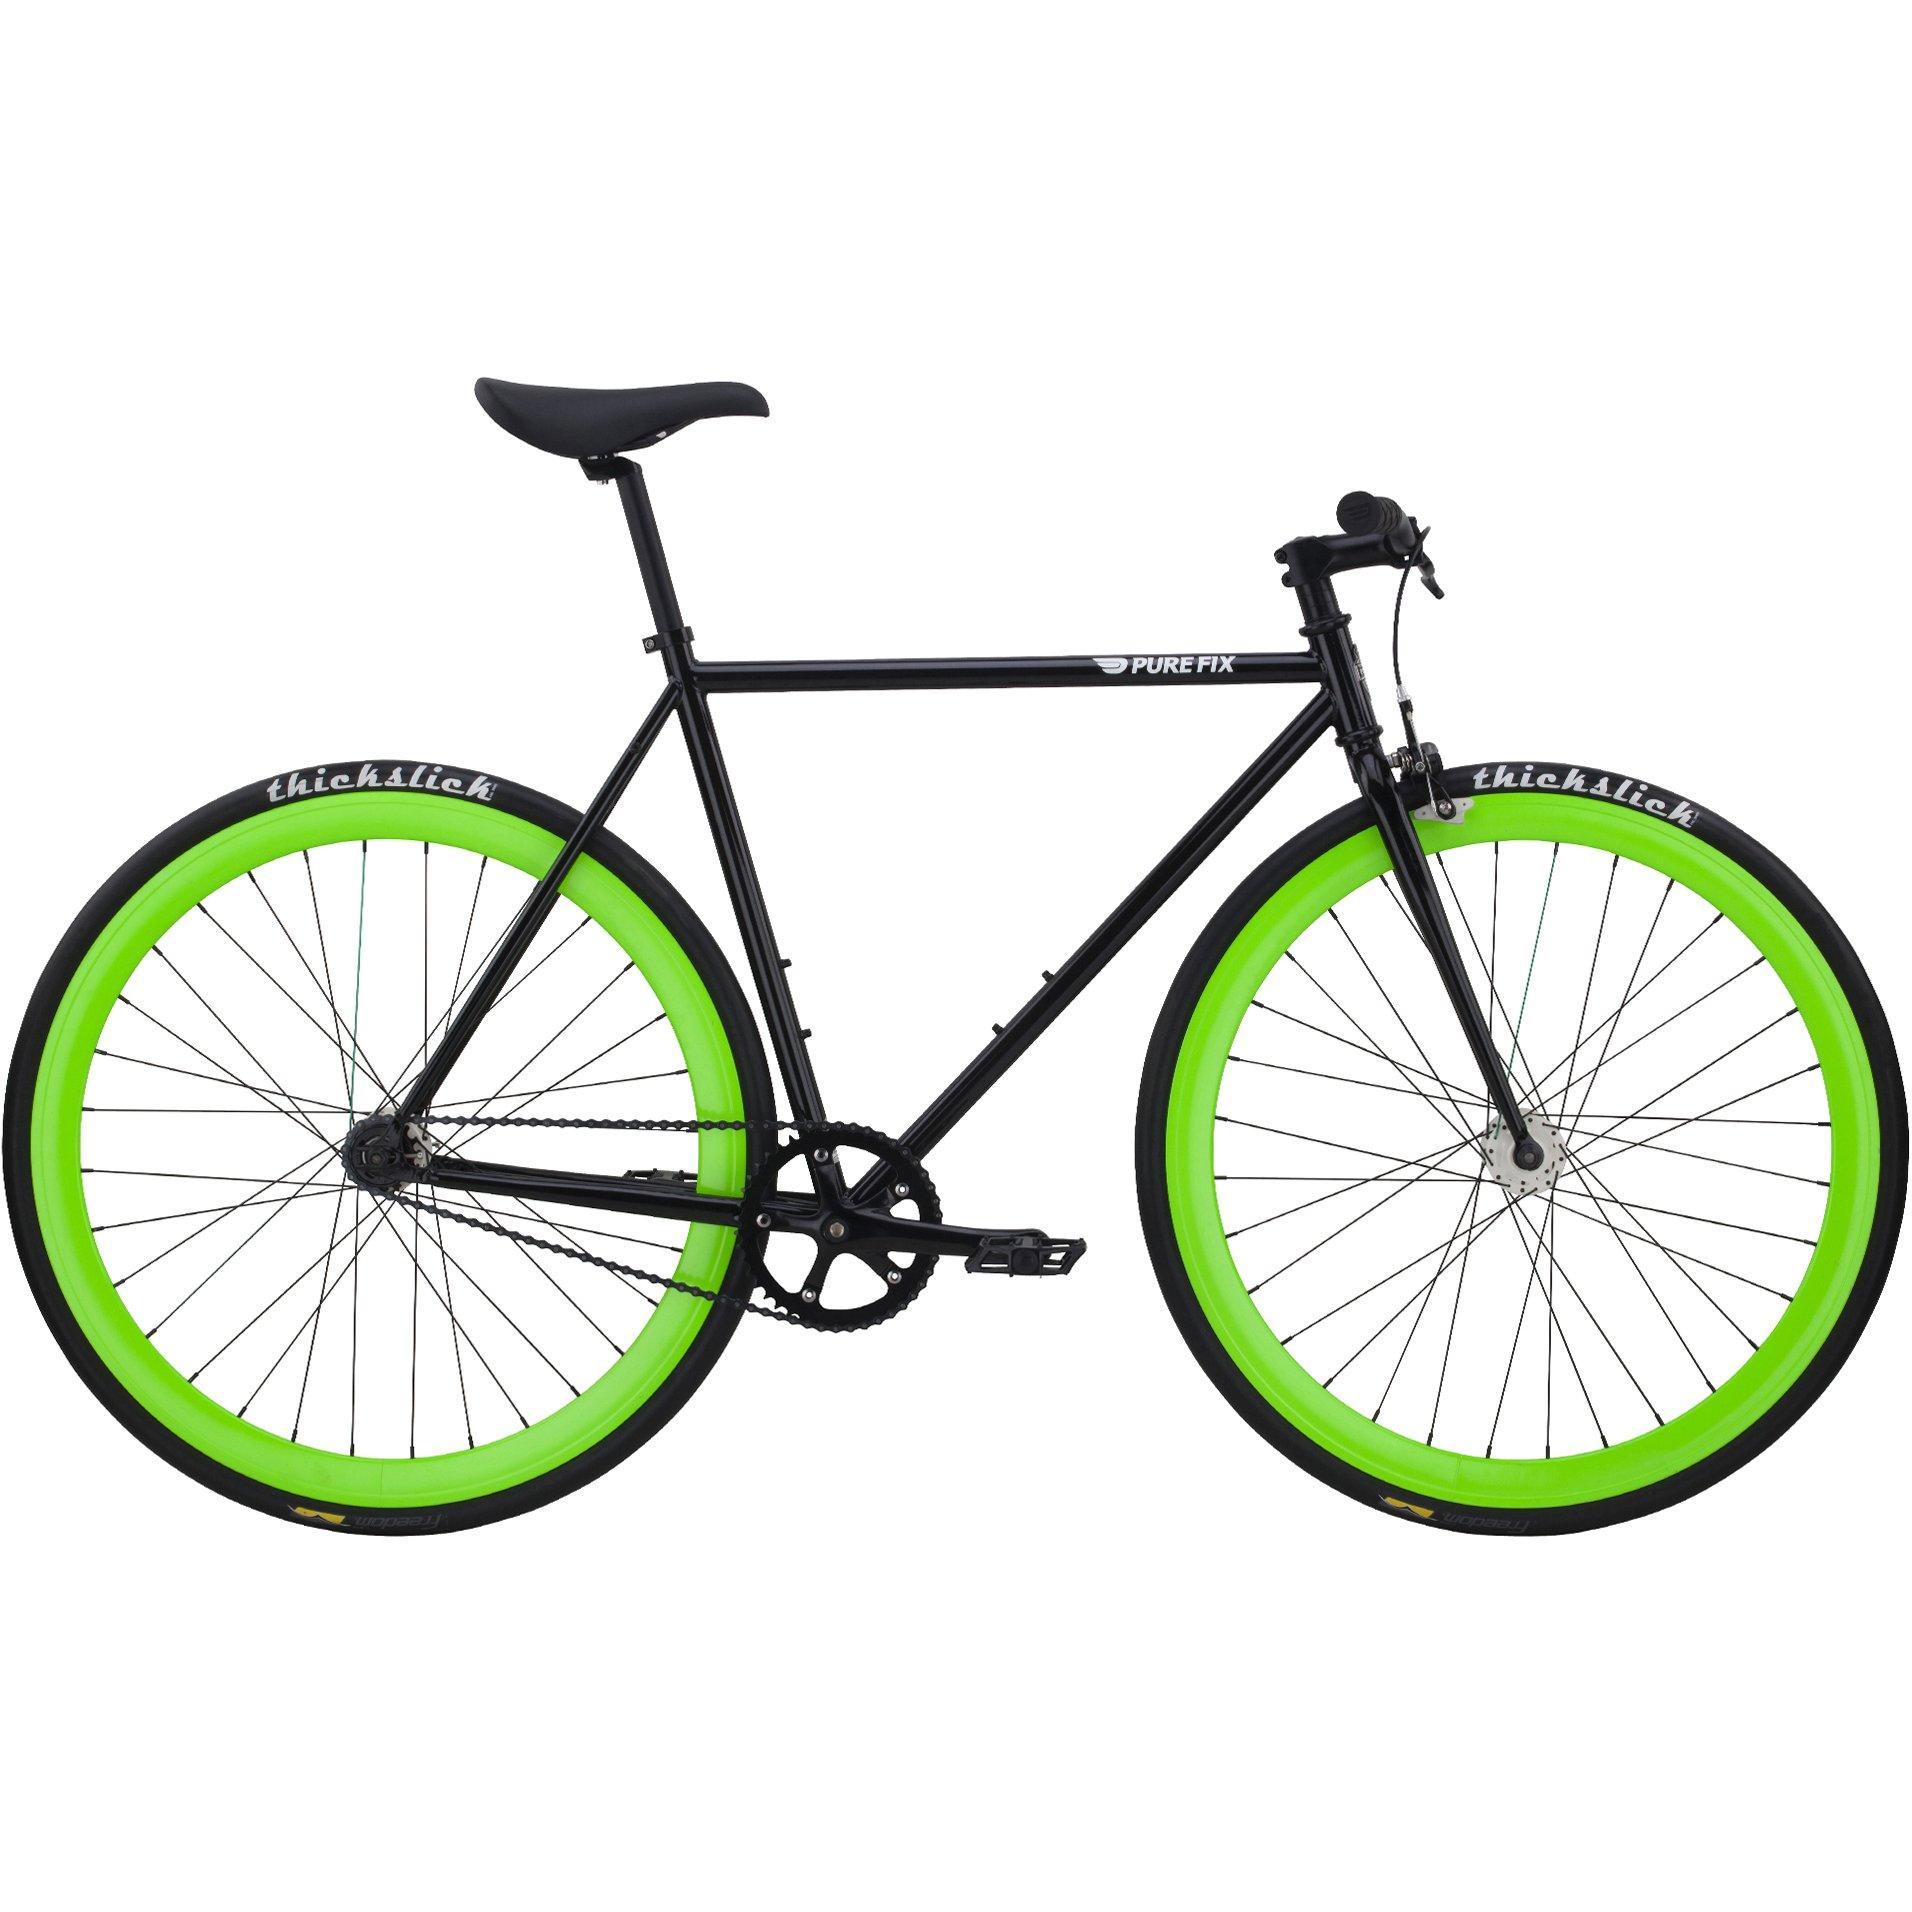 Pure Fix Cycles Fixie The Hotel-Fixed Gear Fahrrad Felgen Leuchten im Dunkeln mit einem Gang - Bicicleta de Carretera, Color Negro, Talla 50 cm/Small: Amazon.es: Deportes y aire libre